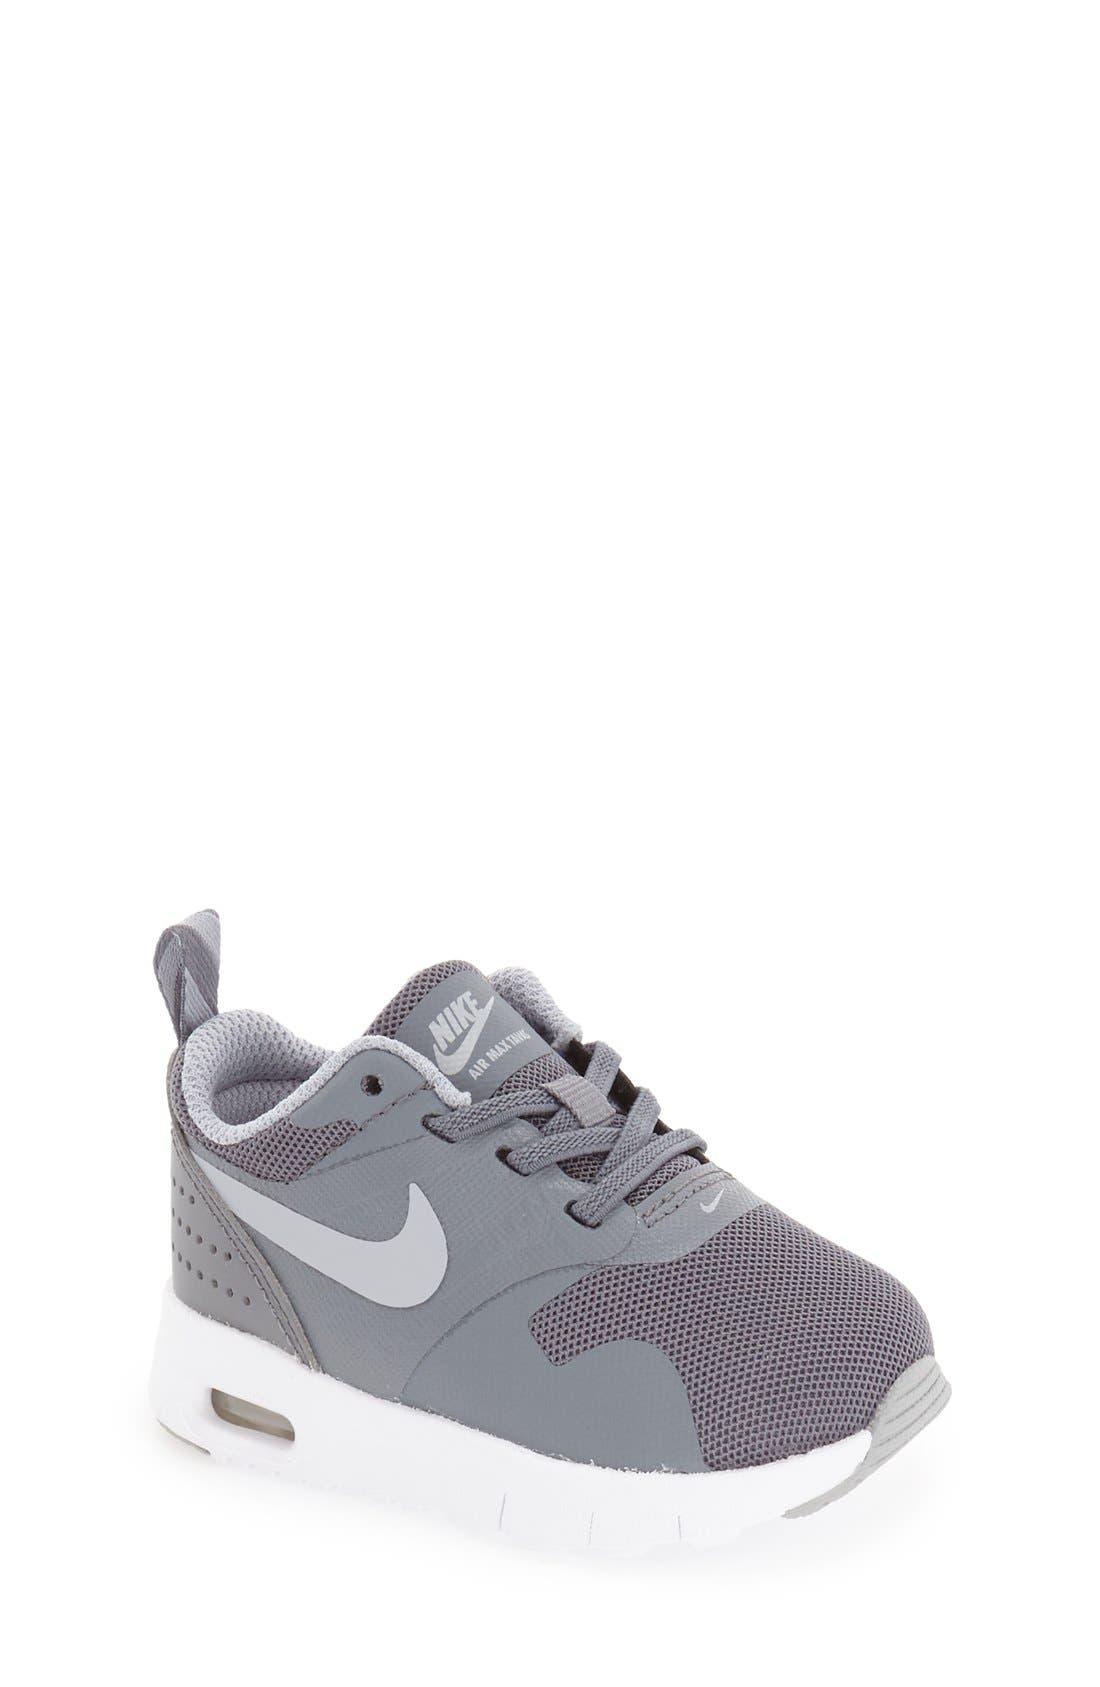 Alternate Image 1 Selected - Nike Air Max Tavas Sneaker (Walker, Toddler & Little Kid)